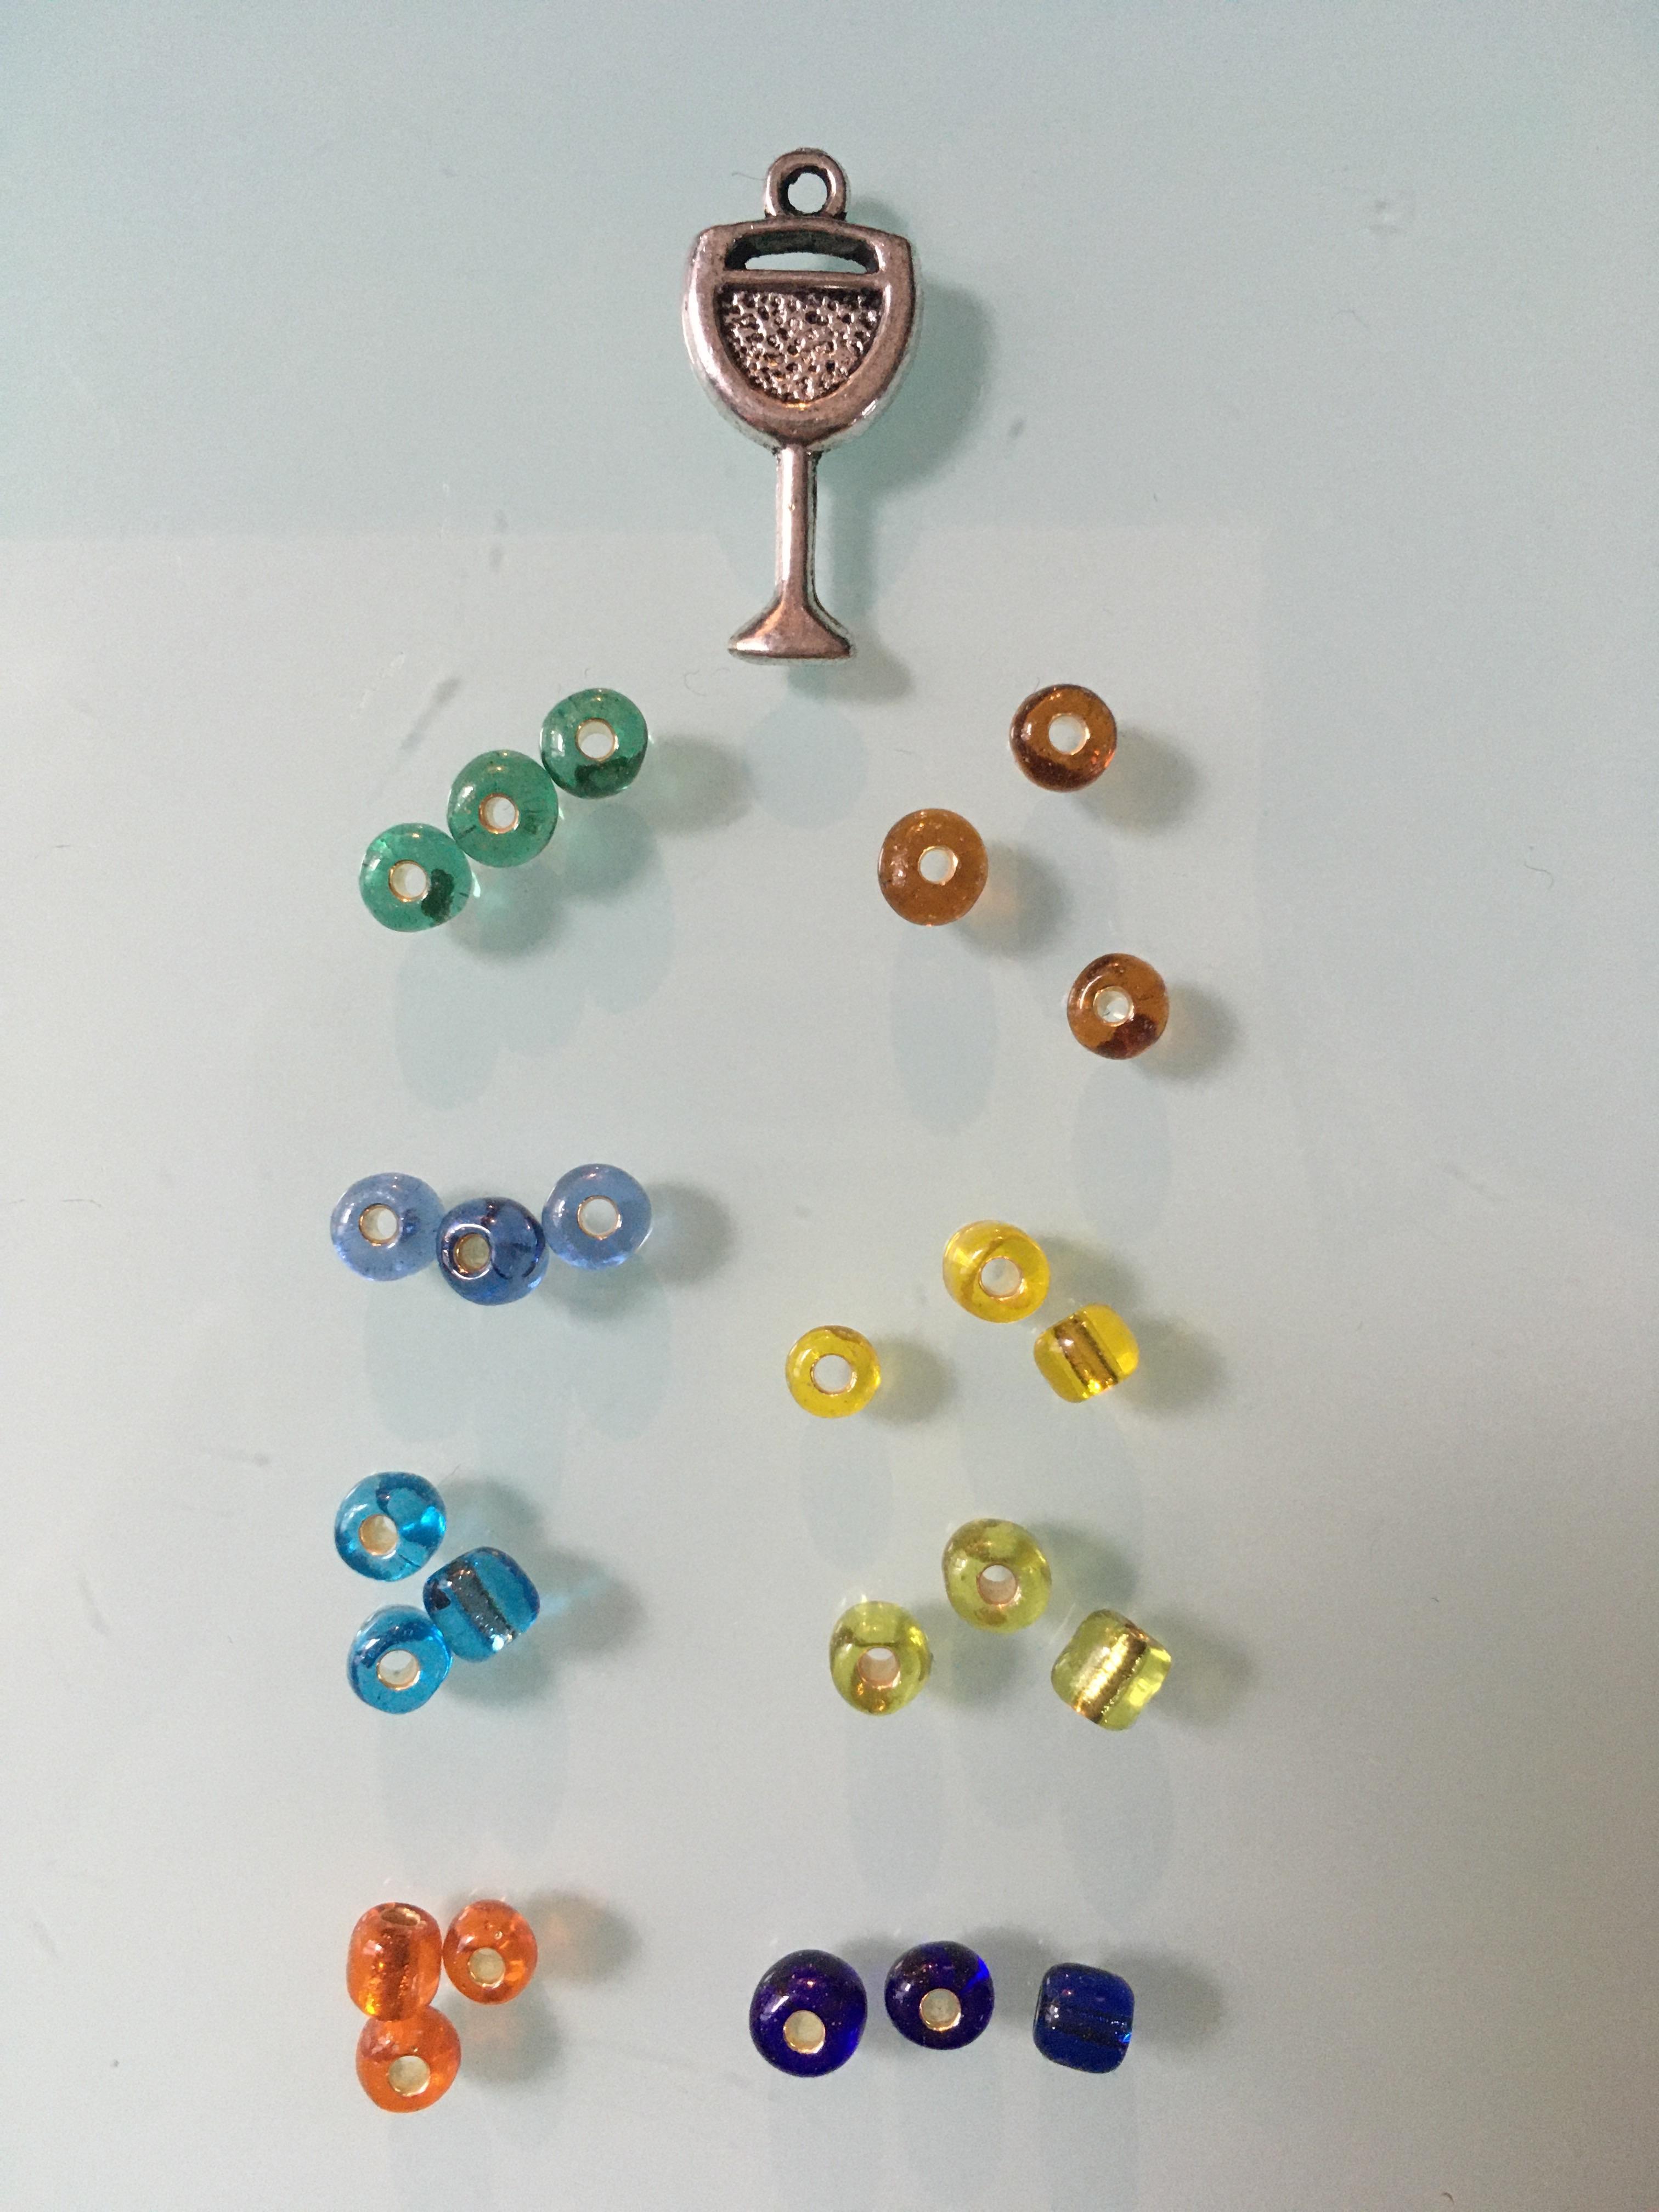 troc de troc lot verre : 8 marques verre image 0